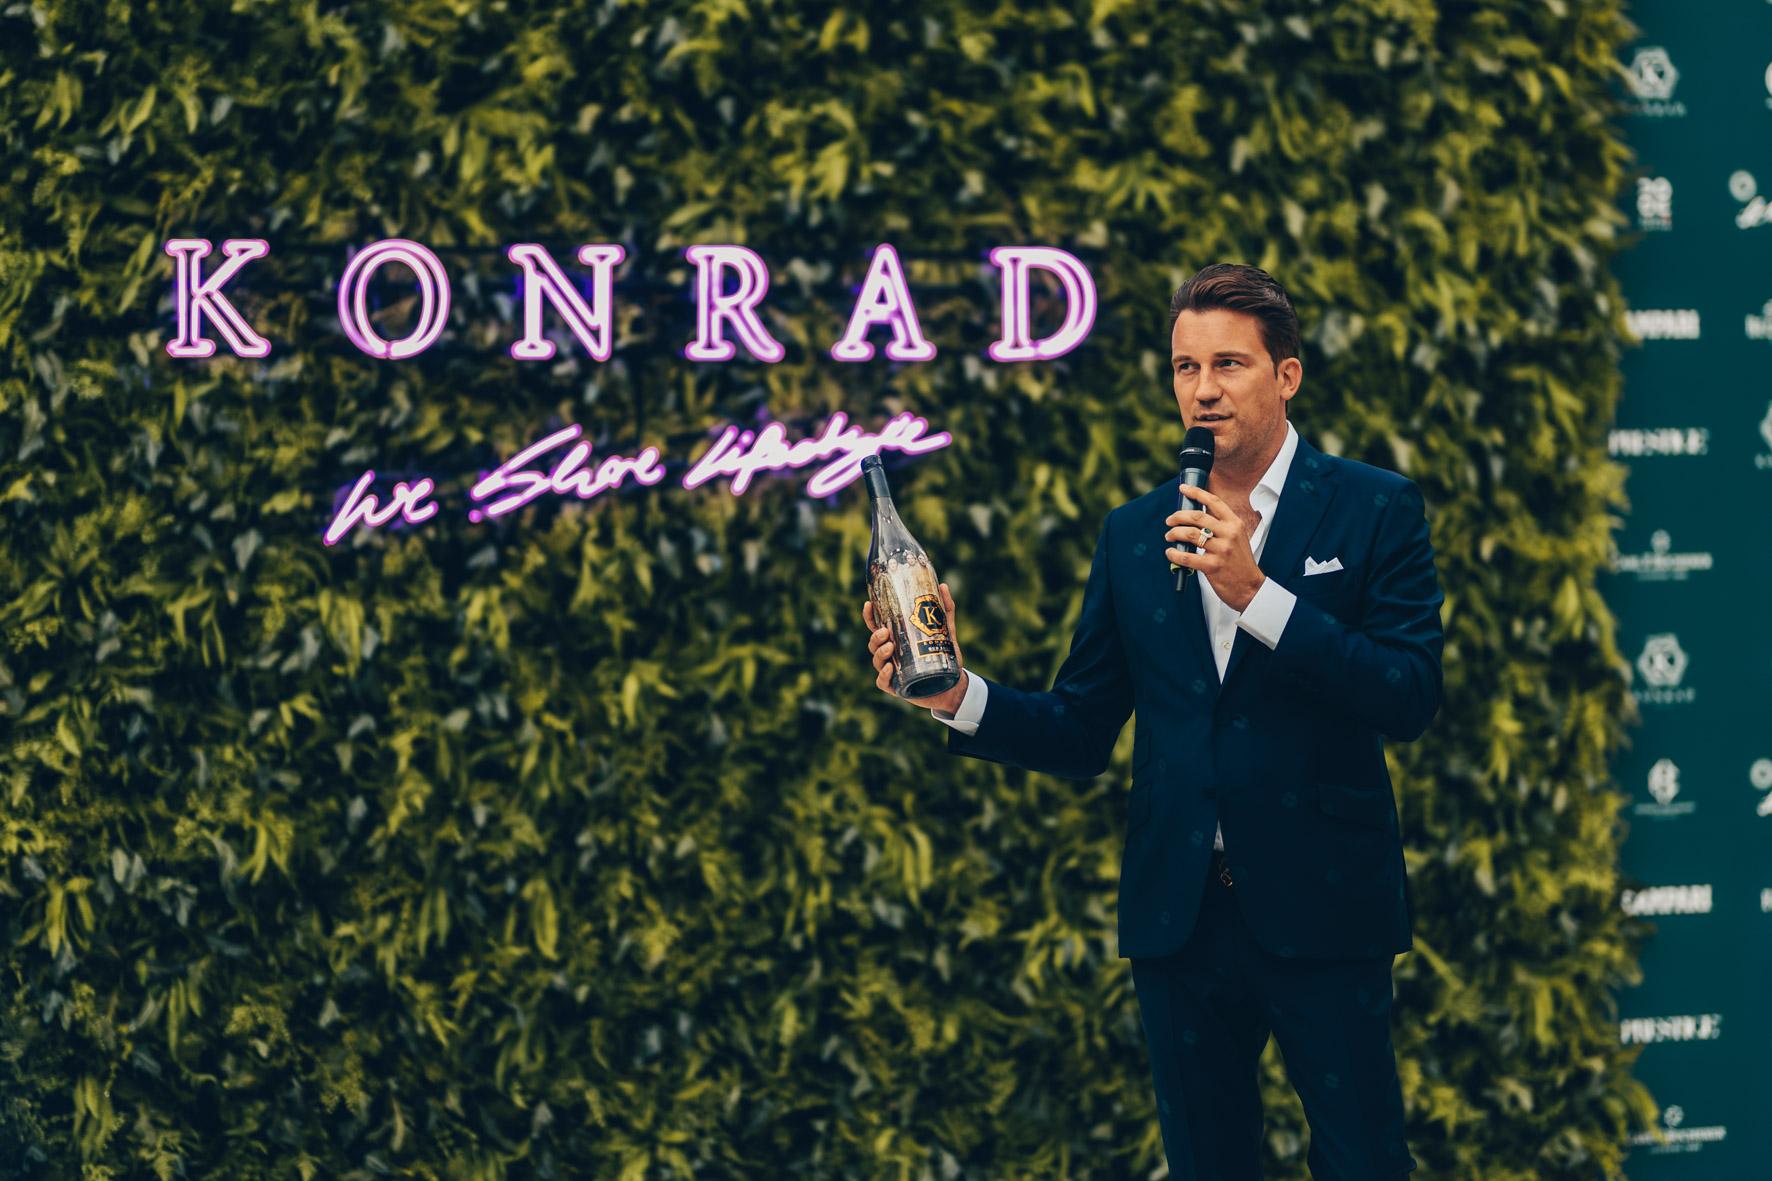 Konrad-lifestyle-art-basel-%22gold-member-experience%22-2019-33.jpg